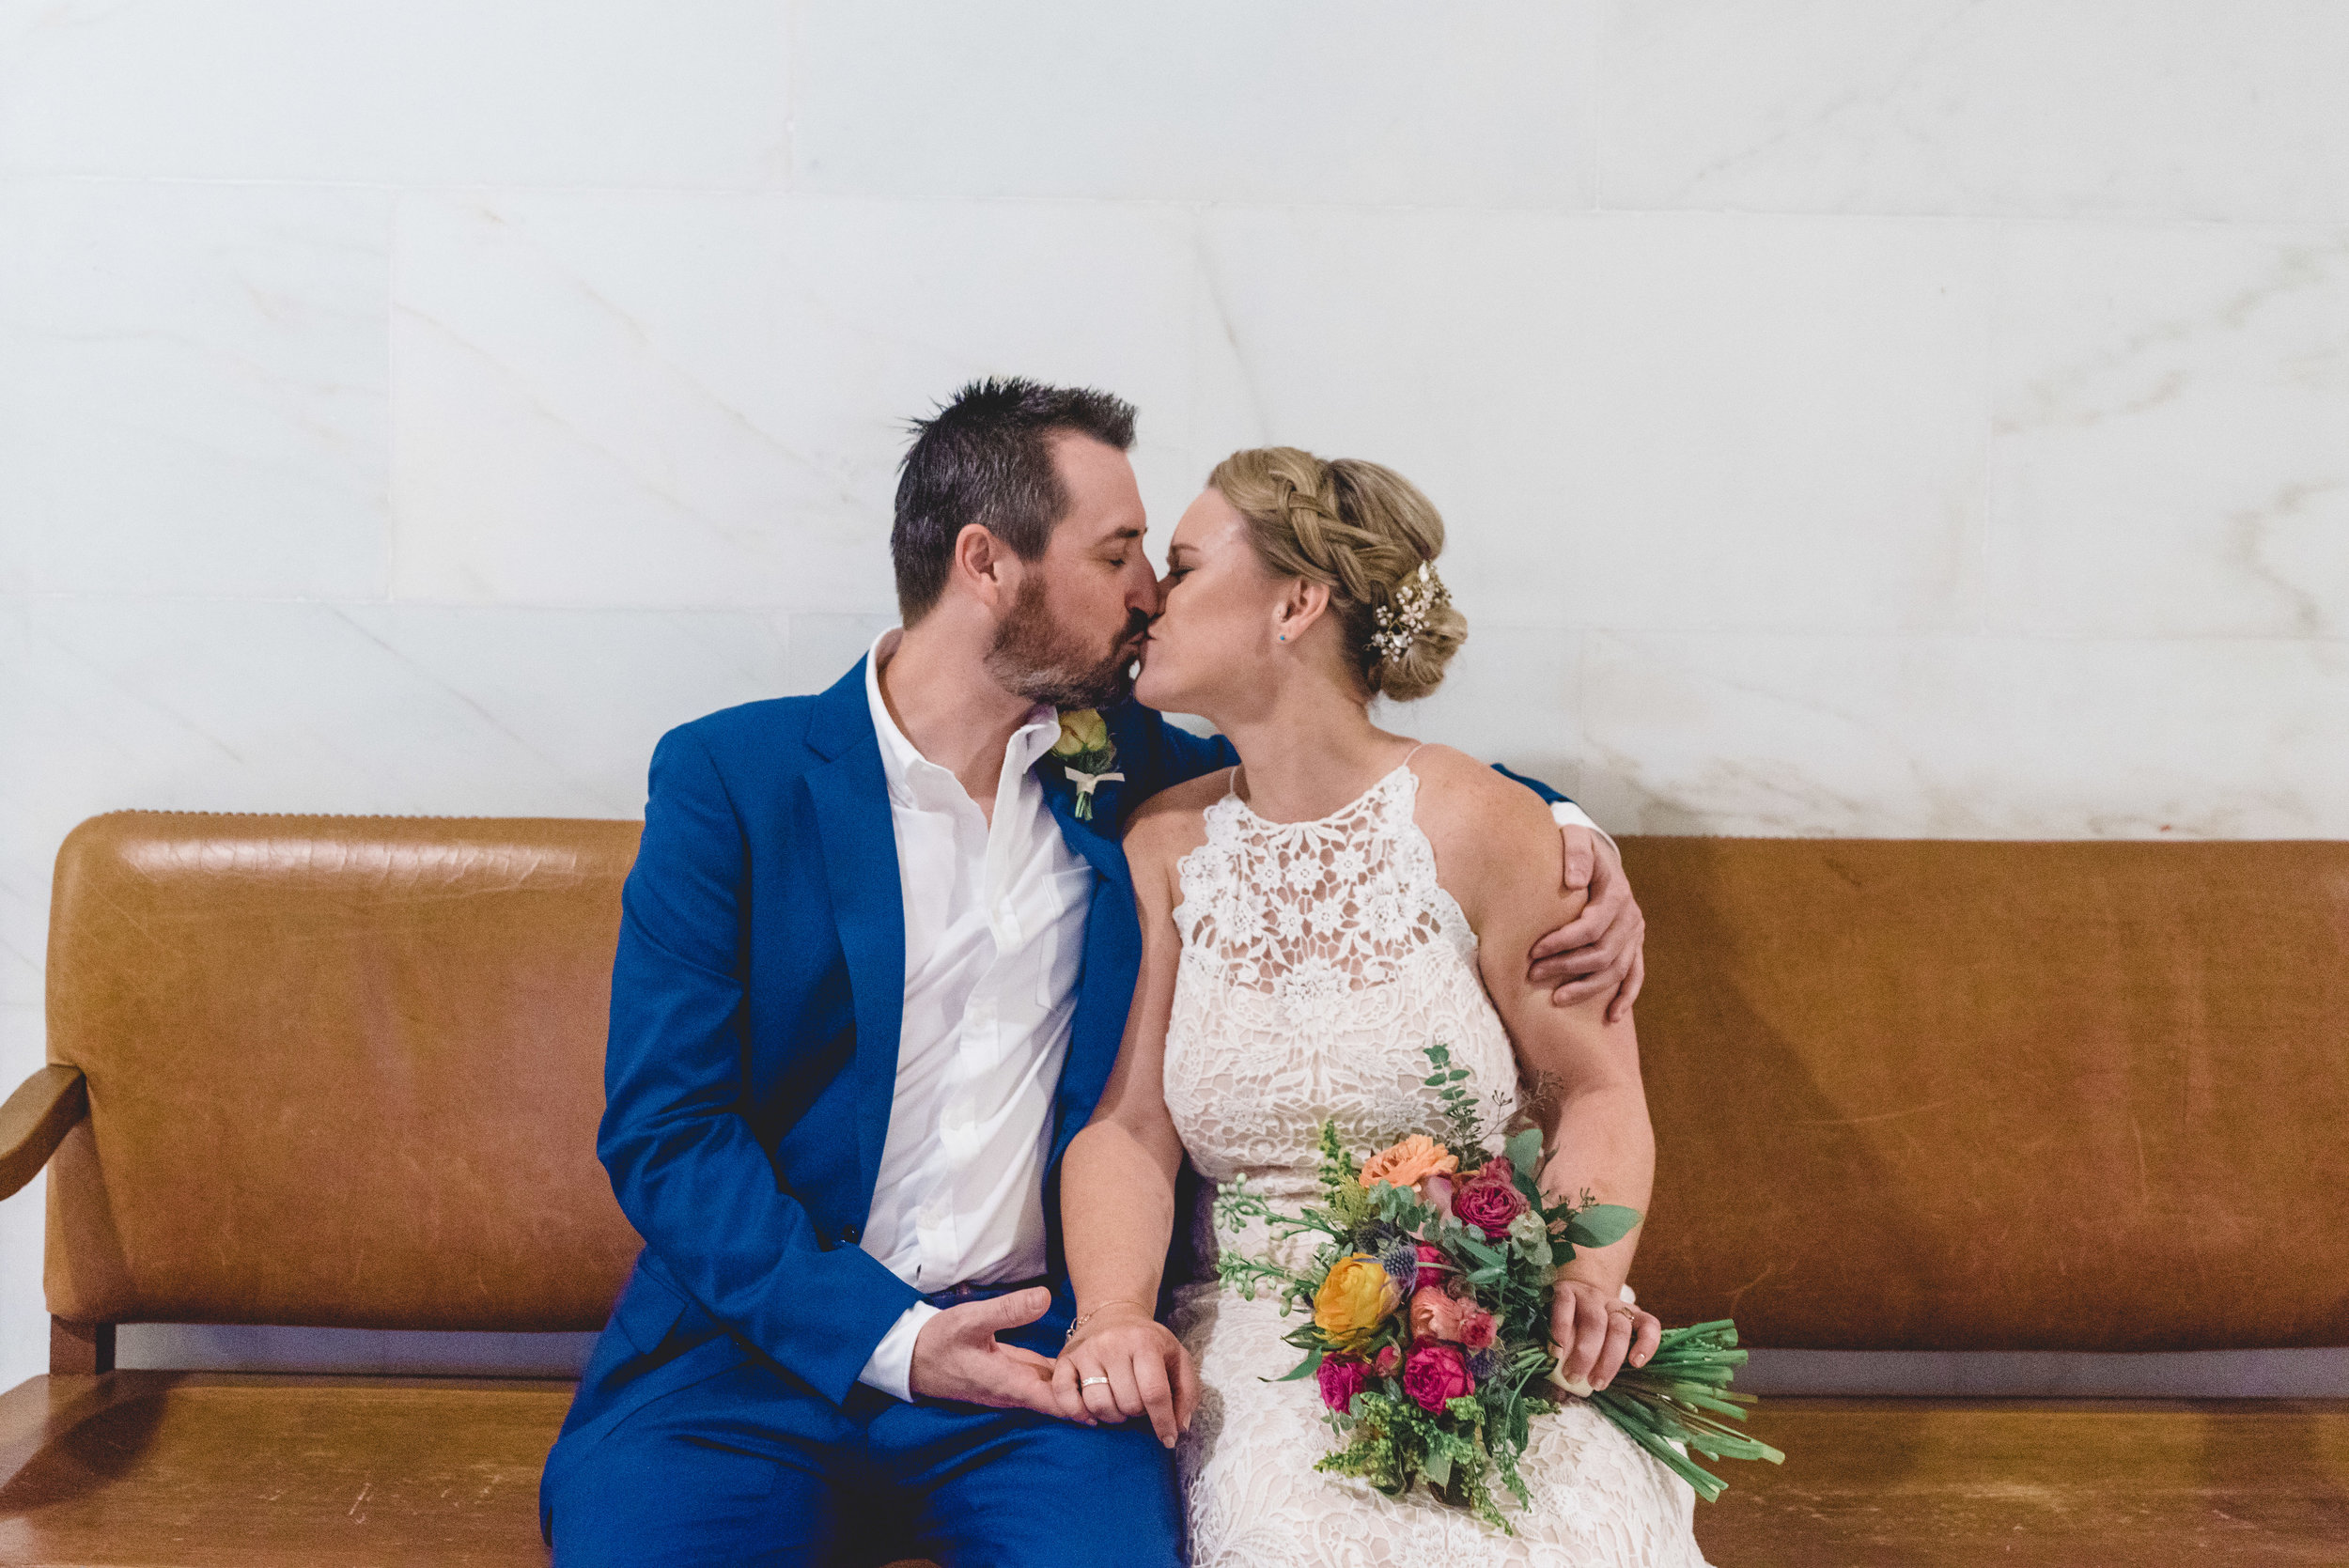 mcdaniels_conroy-wedding-couple-36.jpg